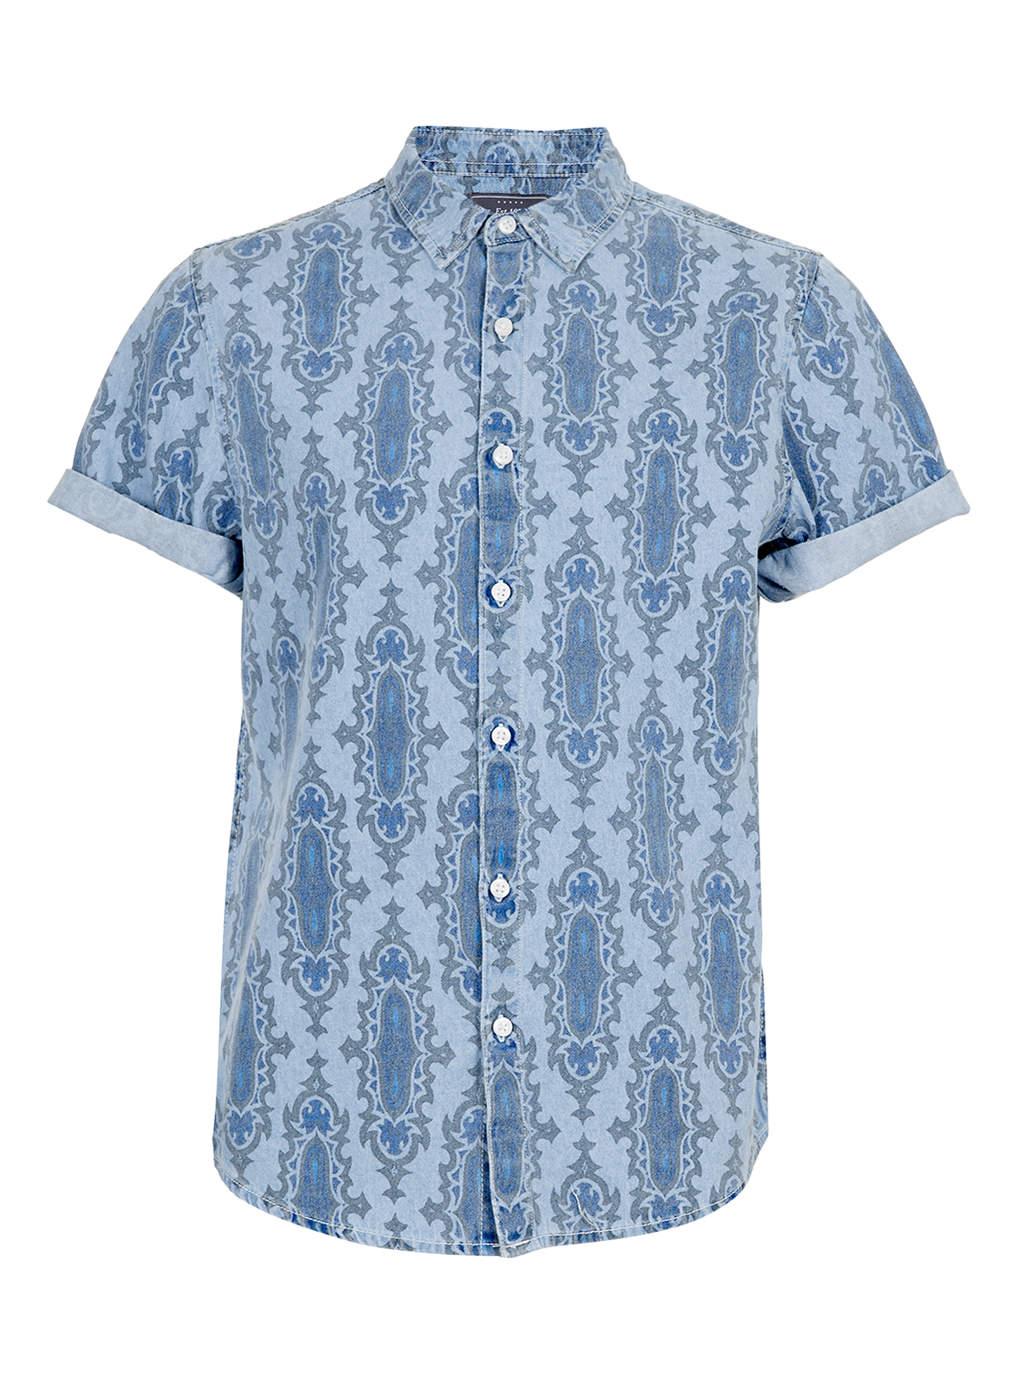 Blue Baroque Print Short Sleeve Shirt, $55